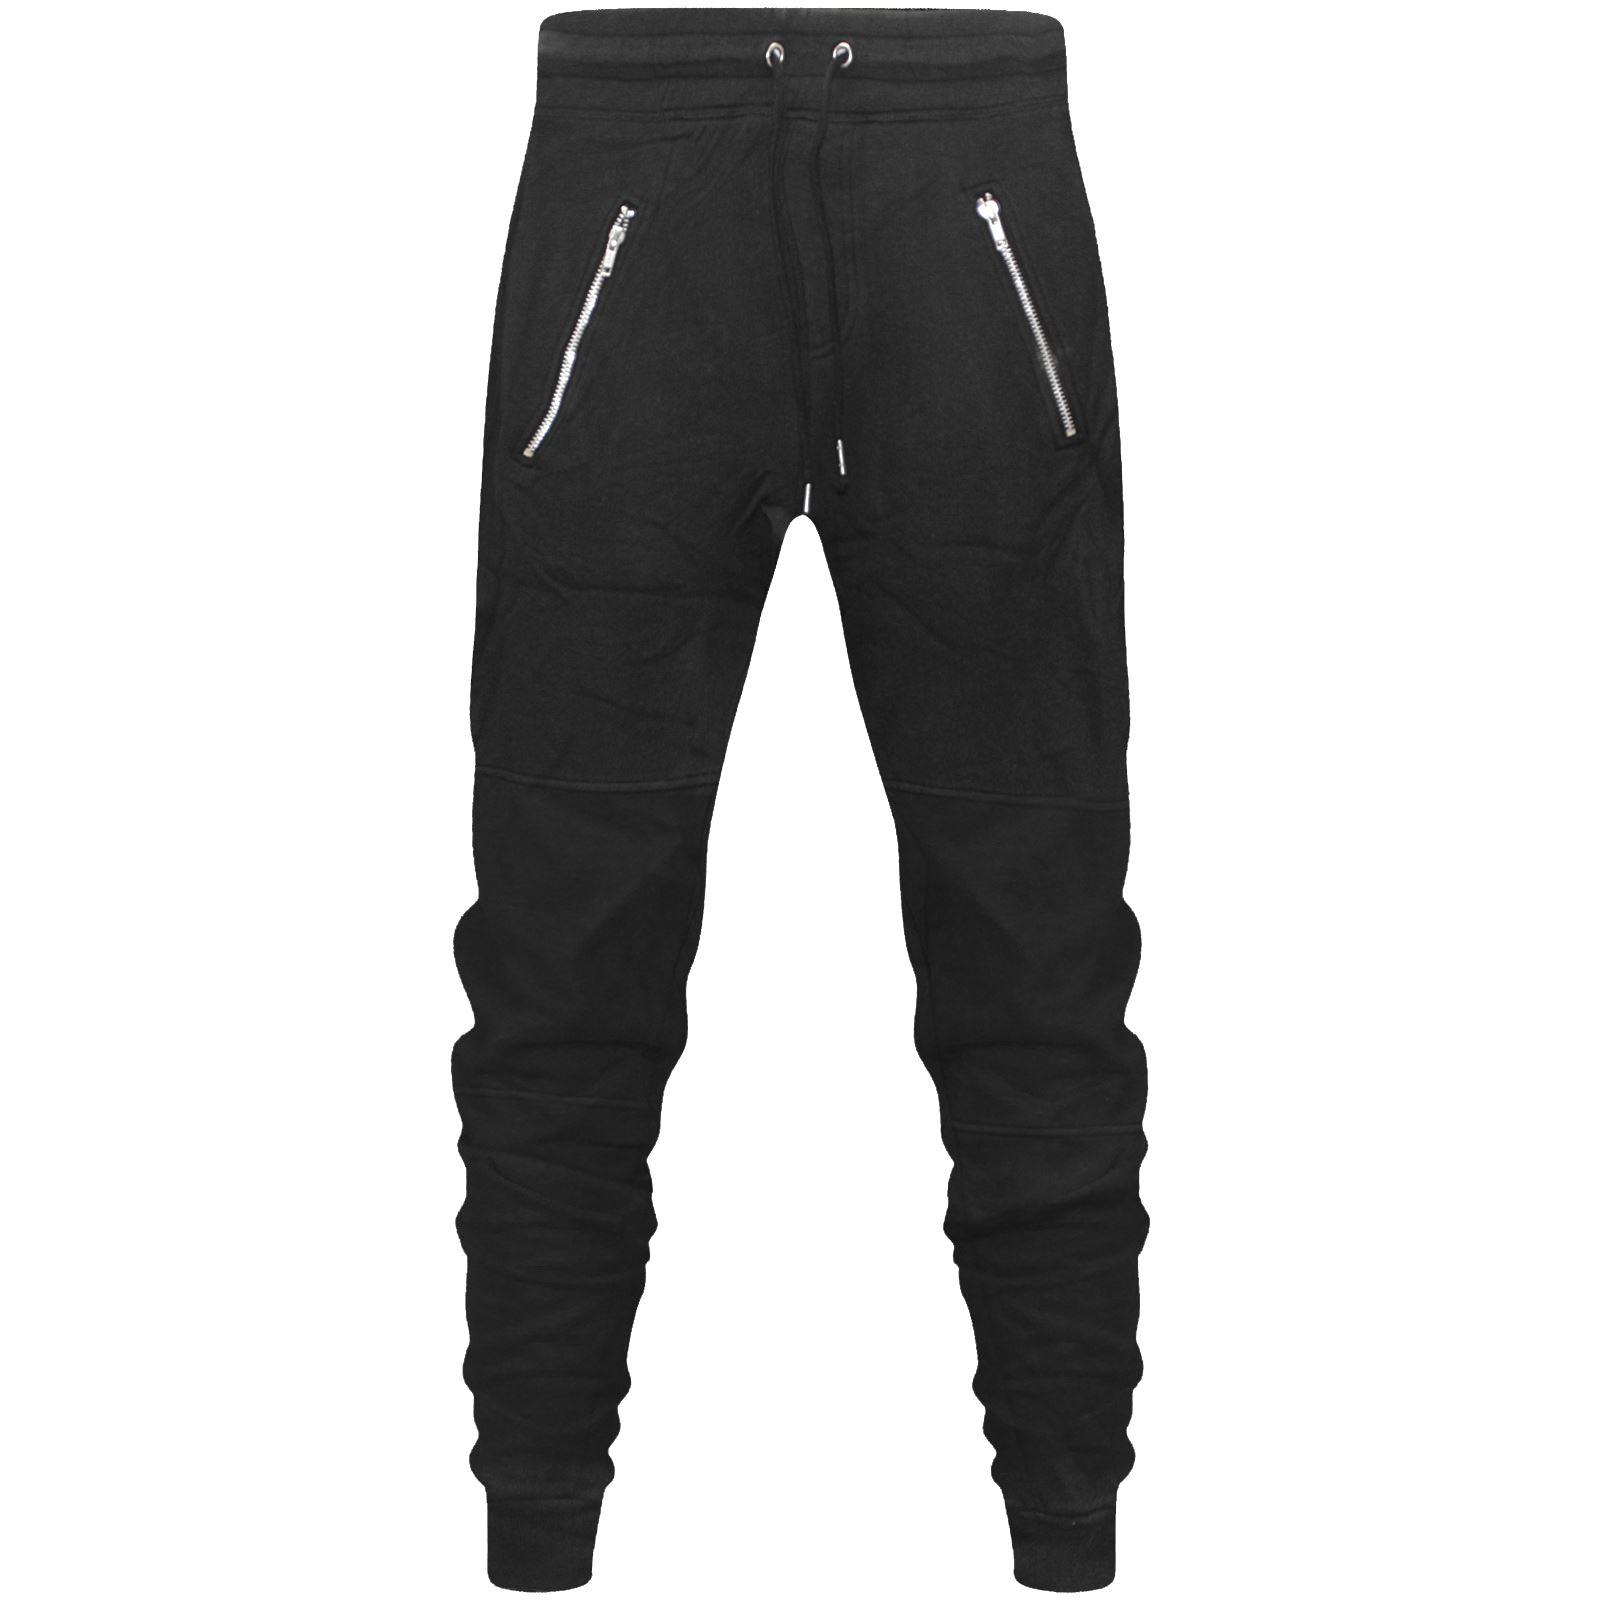 157cfb22f99dc7 New Mens Skinny Slim Fit Joggers Jogging Bottom Fleece Gym Pants Zip ...